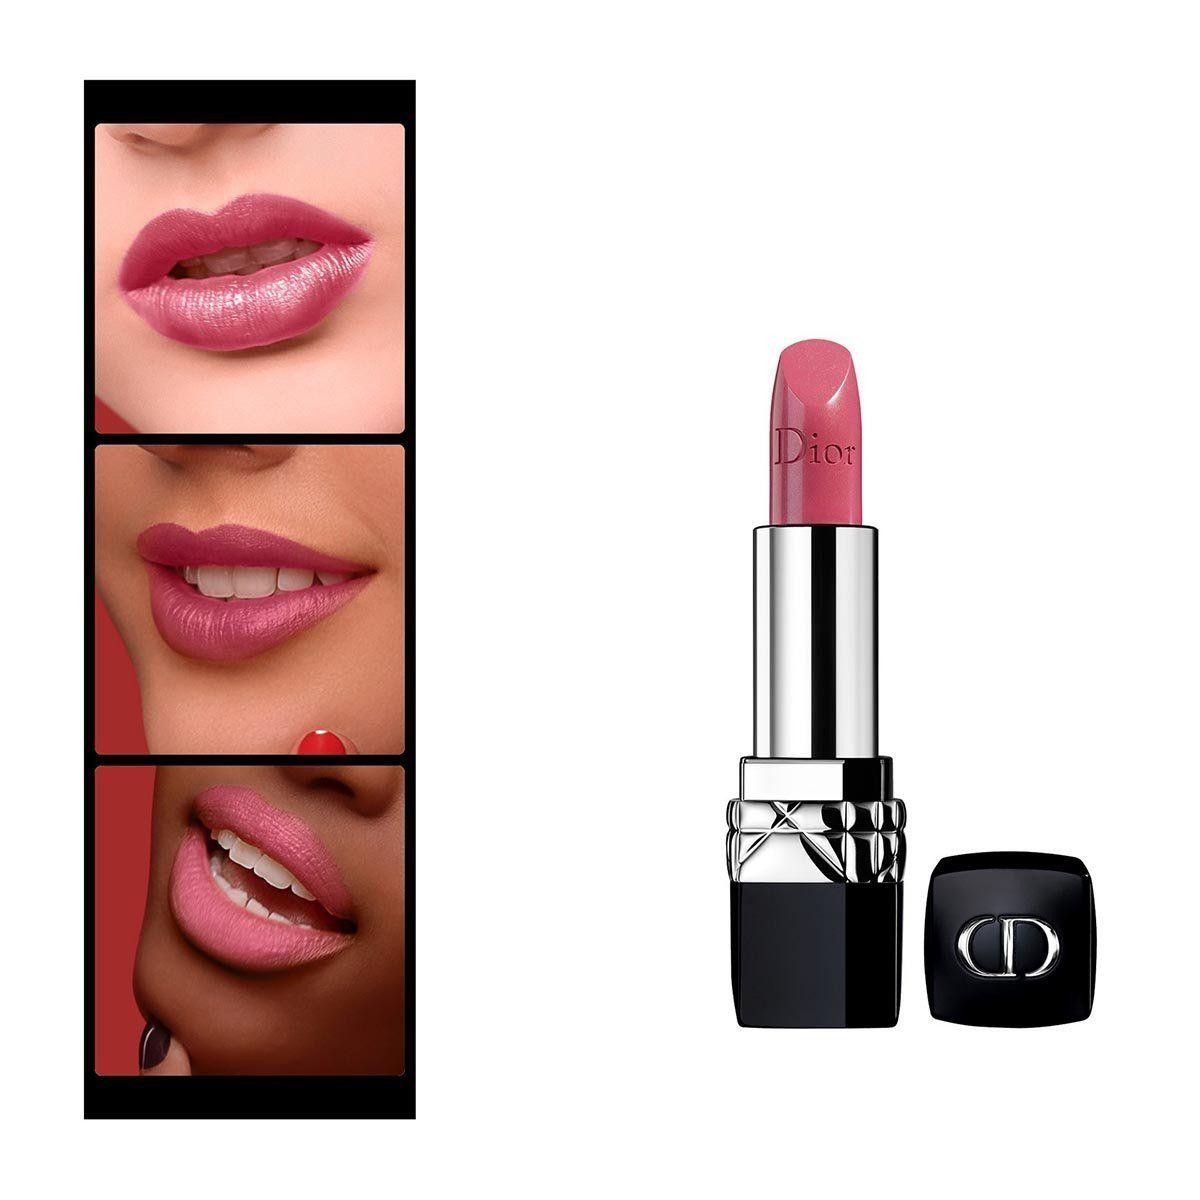 8adeb6f5 Christian Dior Dior Contour Lipliner - 060 Premiere - 1.2g/0.04oz ...